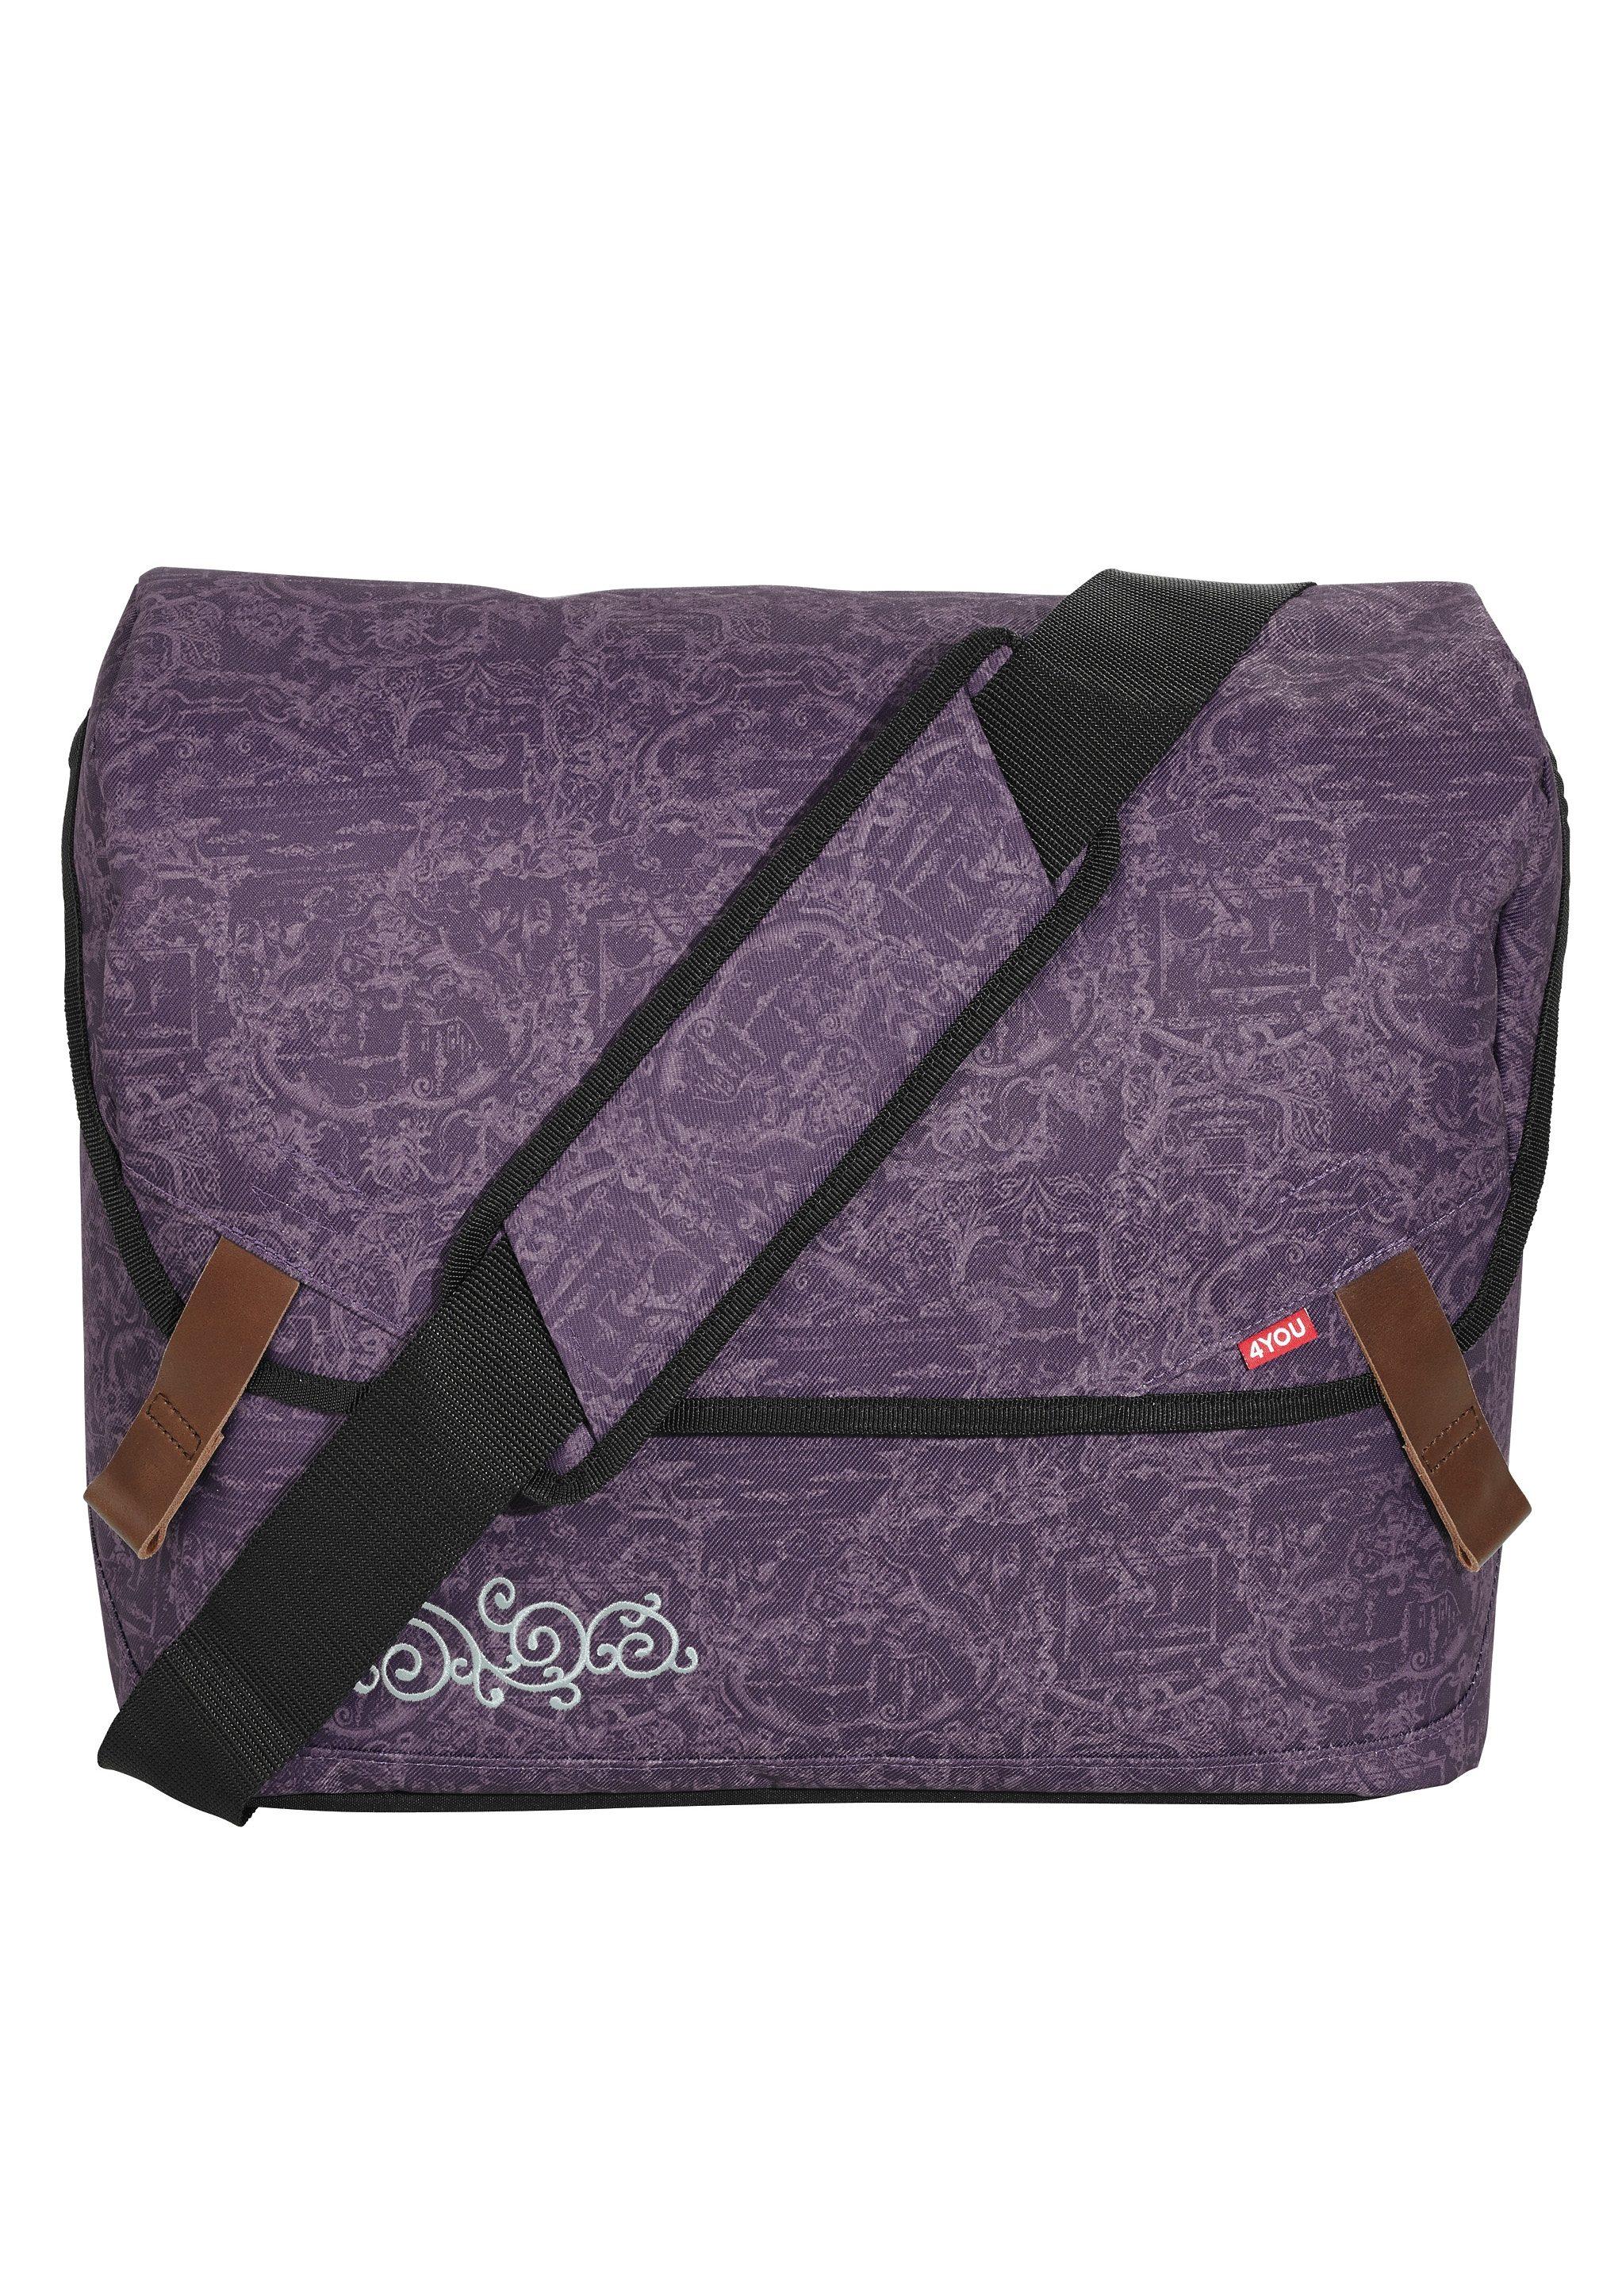 4YOU Umhängetasche mit Laptopfach, Candy Barock, »Messengerbag«